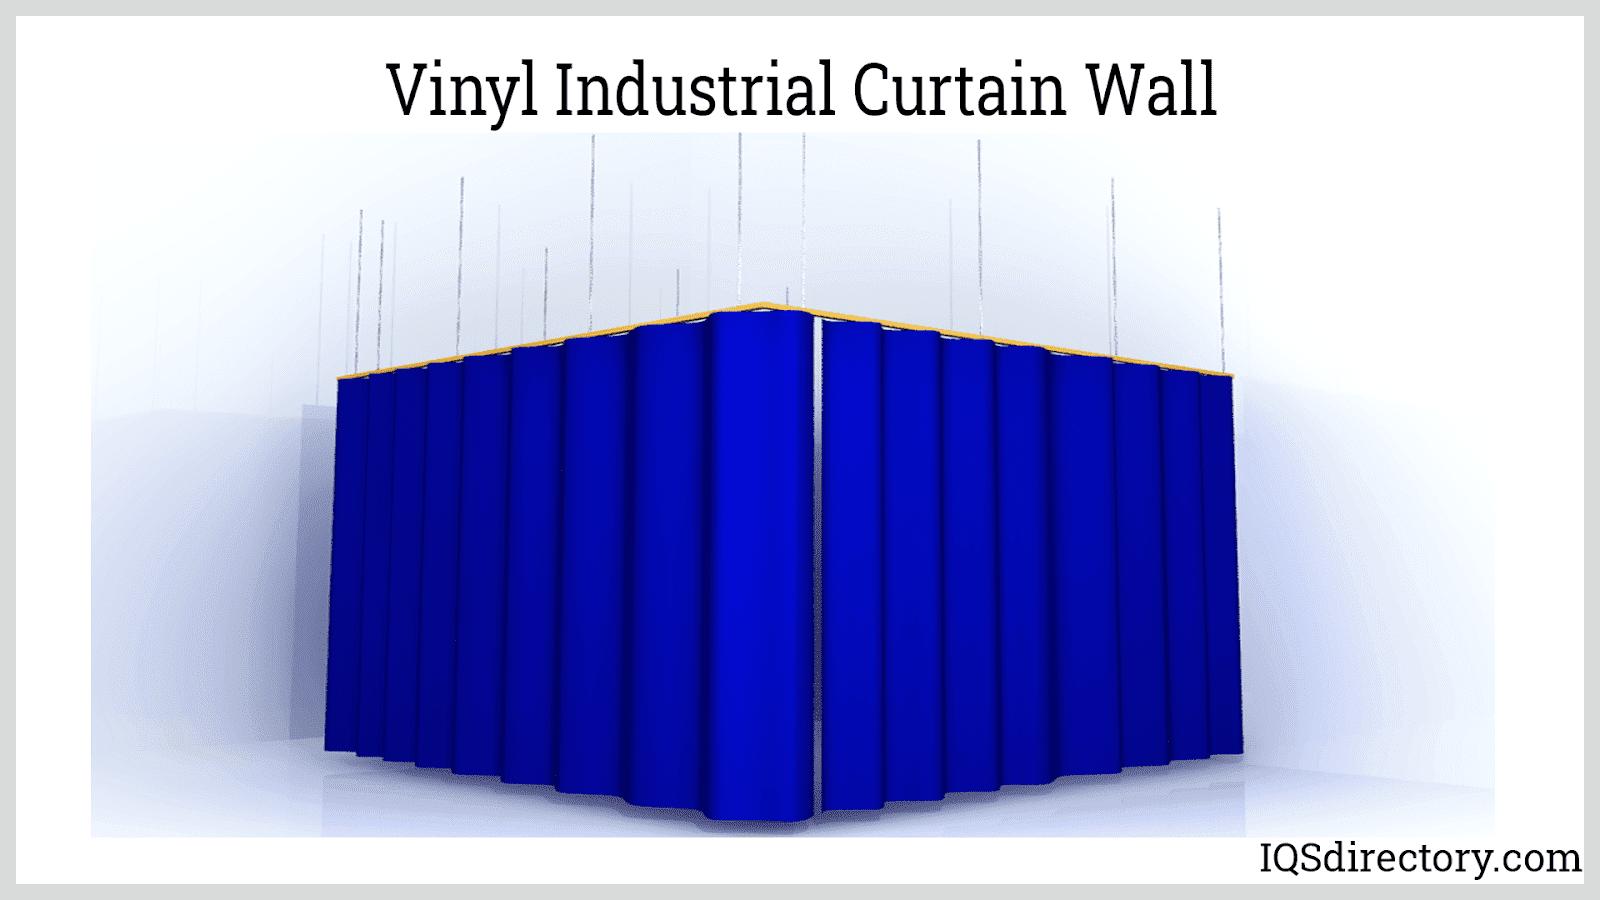 Vinyl Industrial Curtain Wall